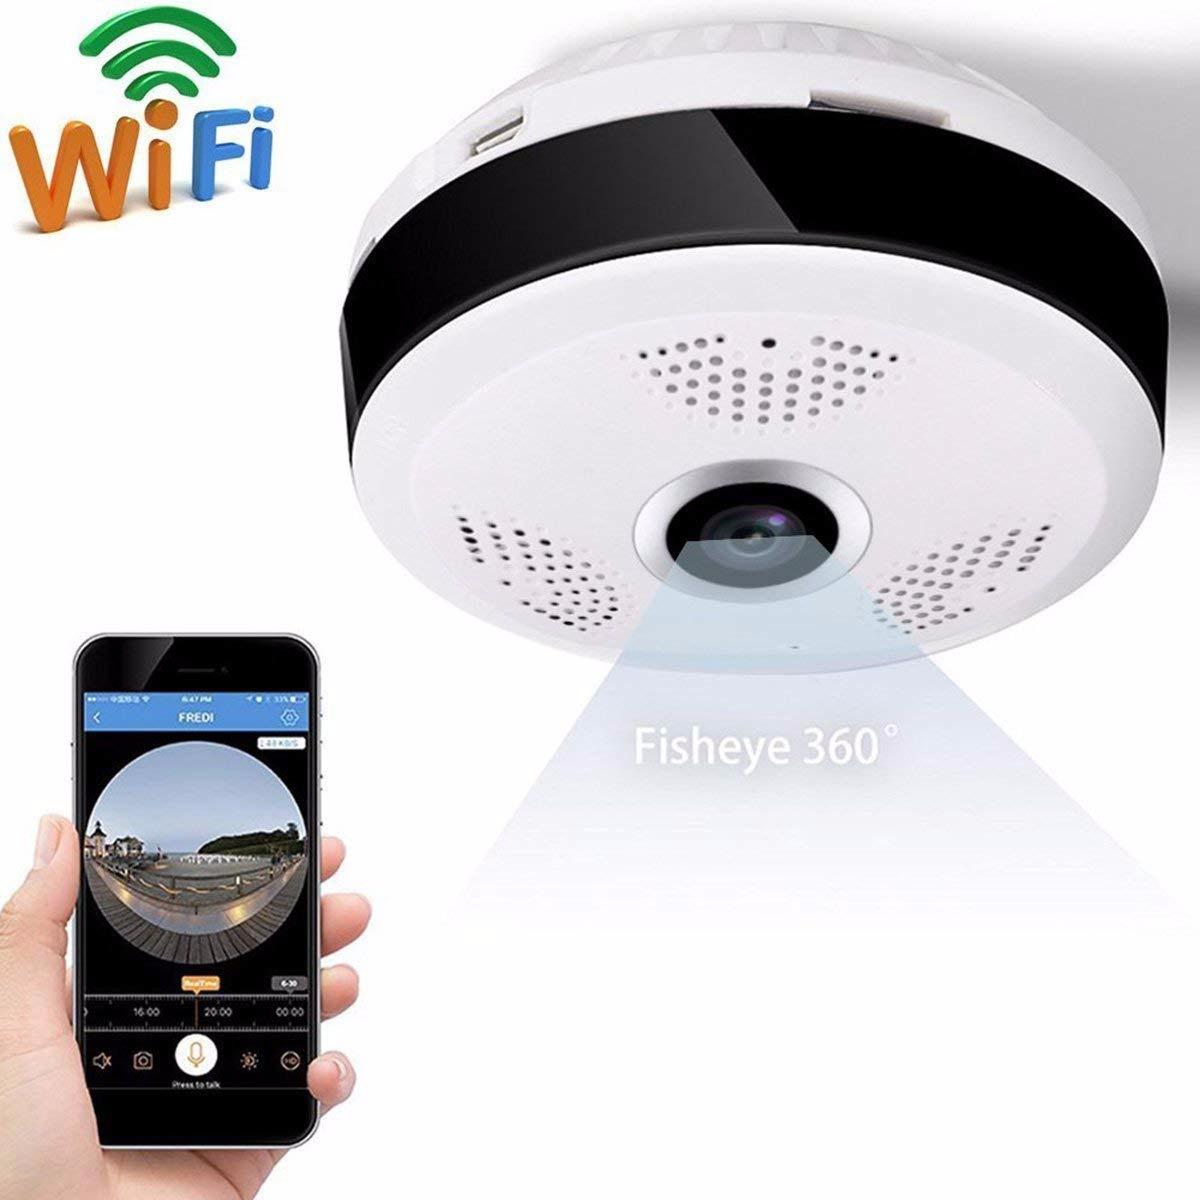 Home Safe Camera,iRULU HD 1080P VR WiFi IP Camera 2.0MP,Motion Detection,P2P,Two-Way Audio IR 360 Degree IP CAM WI-FI P2P Alarm (Size1, White)